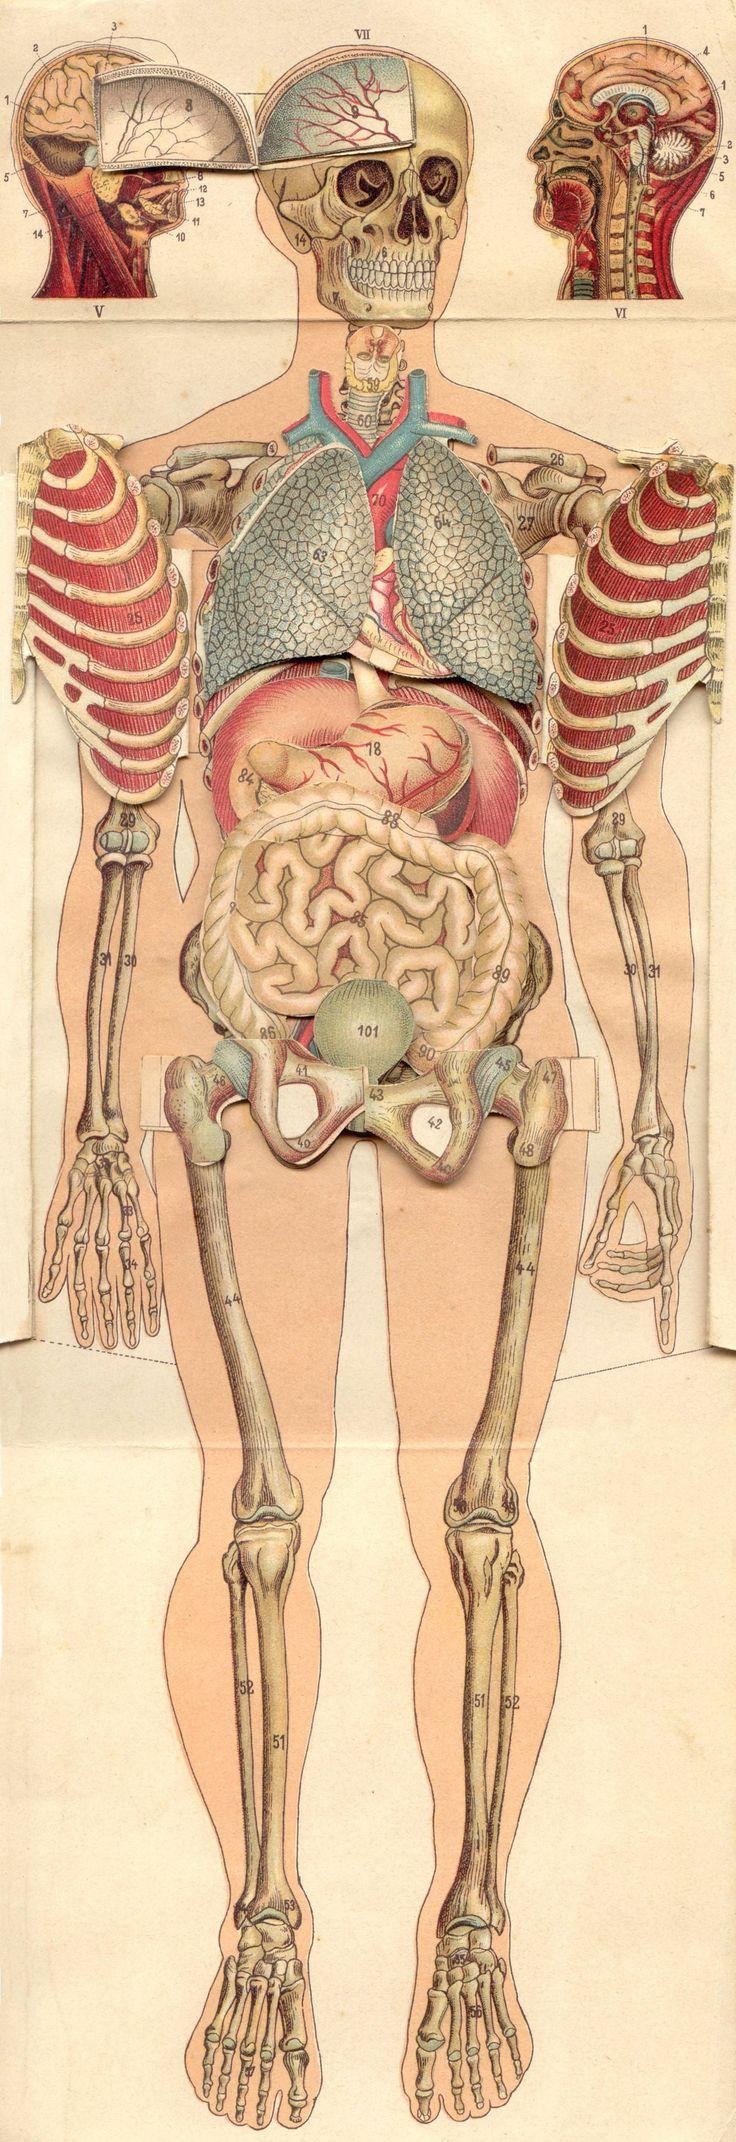 419 best anatomia images on Pinterest | Anatomy, Human anatomy and ...